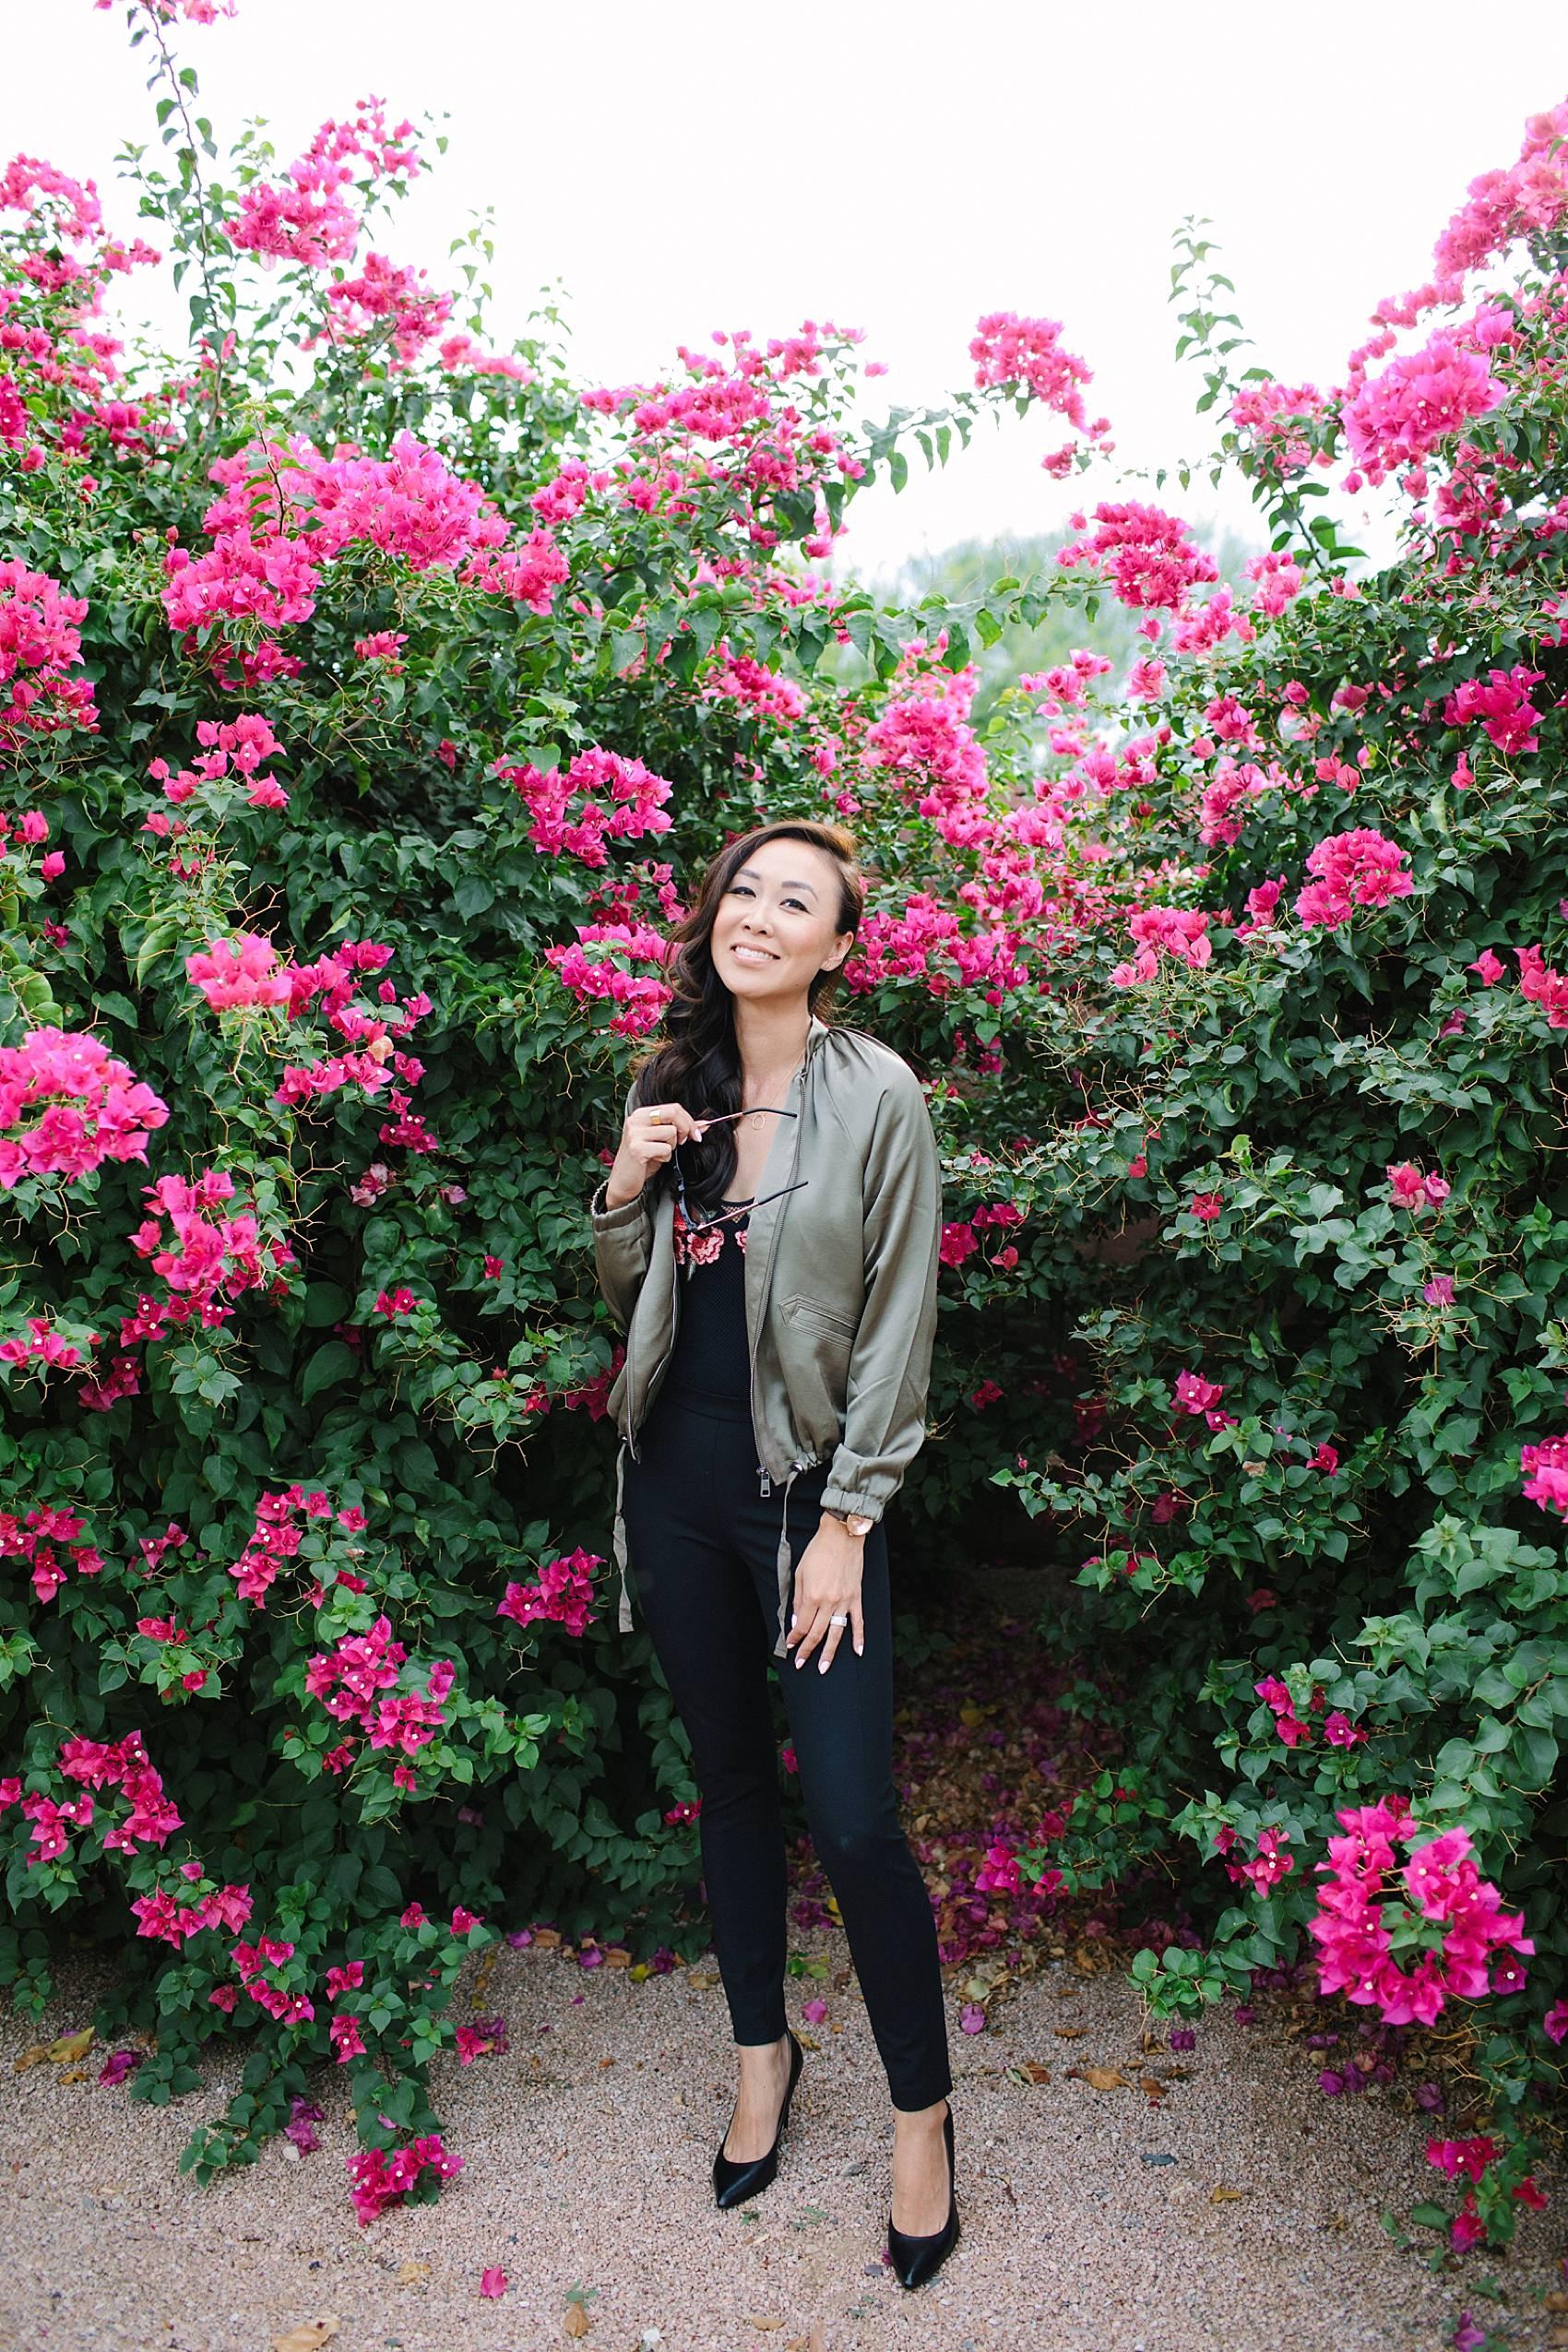 diana elizabeth lifestyle blogger in black devon-fit bi-stretch leggings and satin bomber jacket by banana republic standing in front of pink bougevvilla plants black netting bodysuit